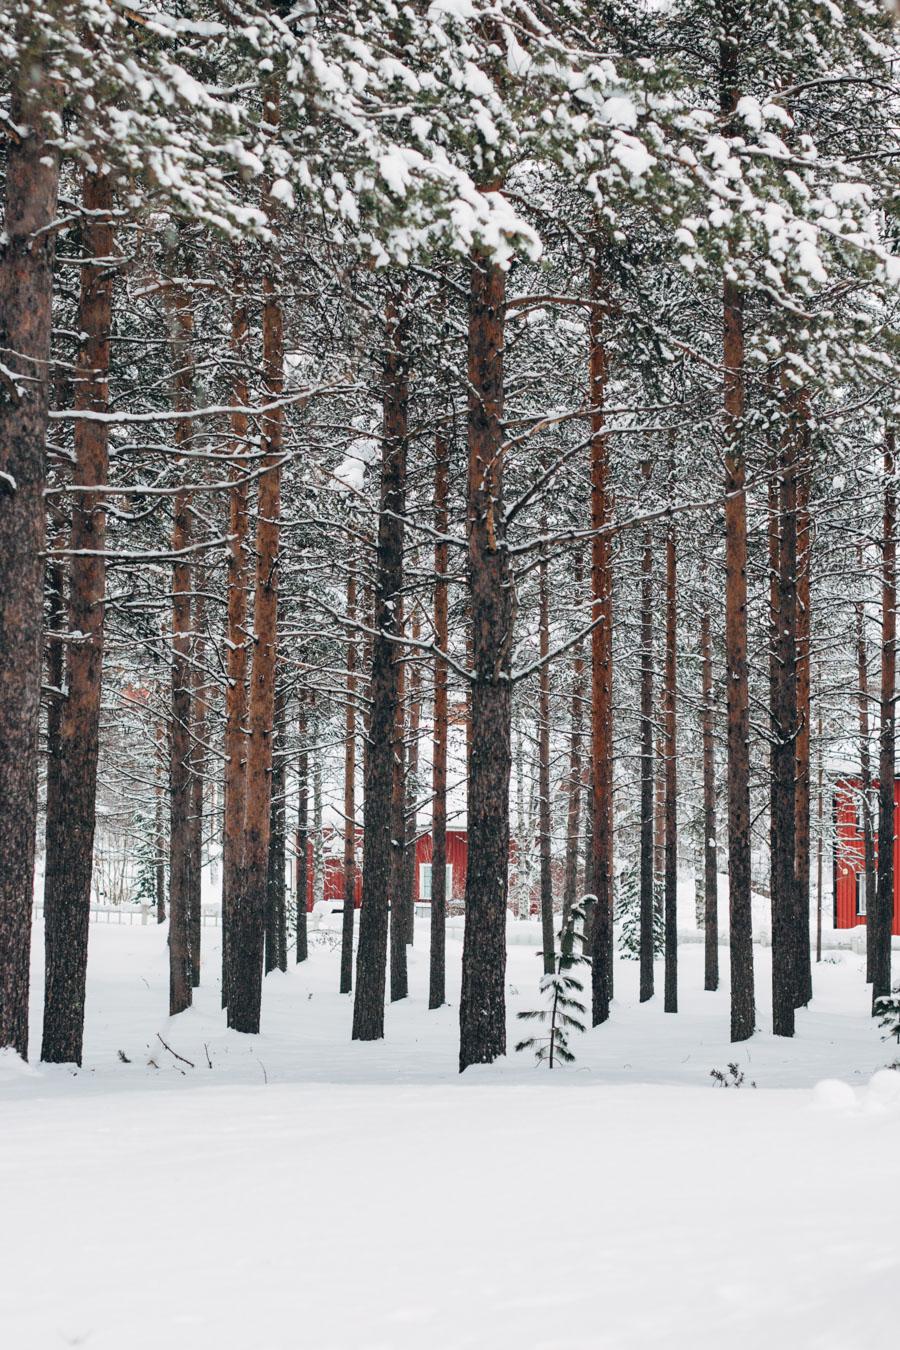 Jokkmokk forest Swedish Lapland